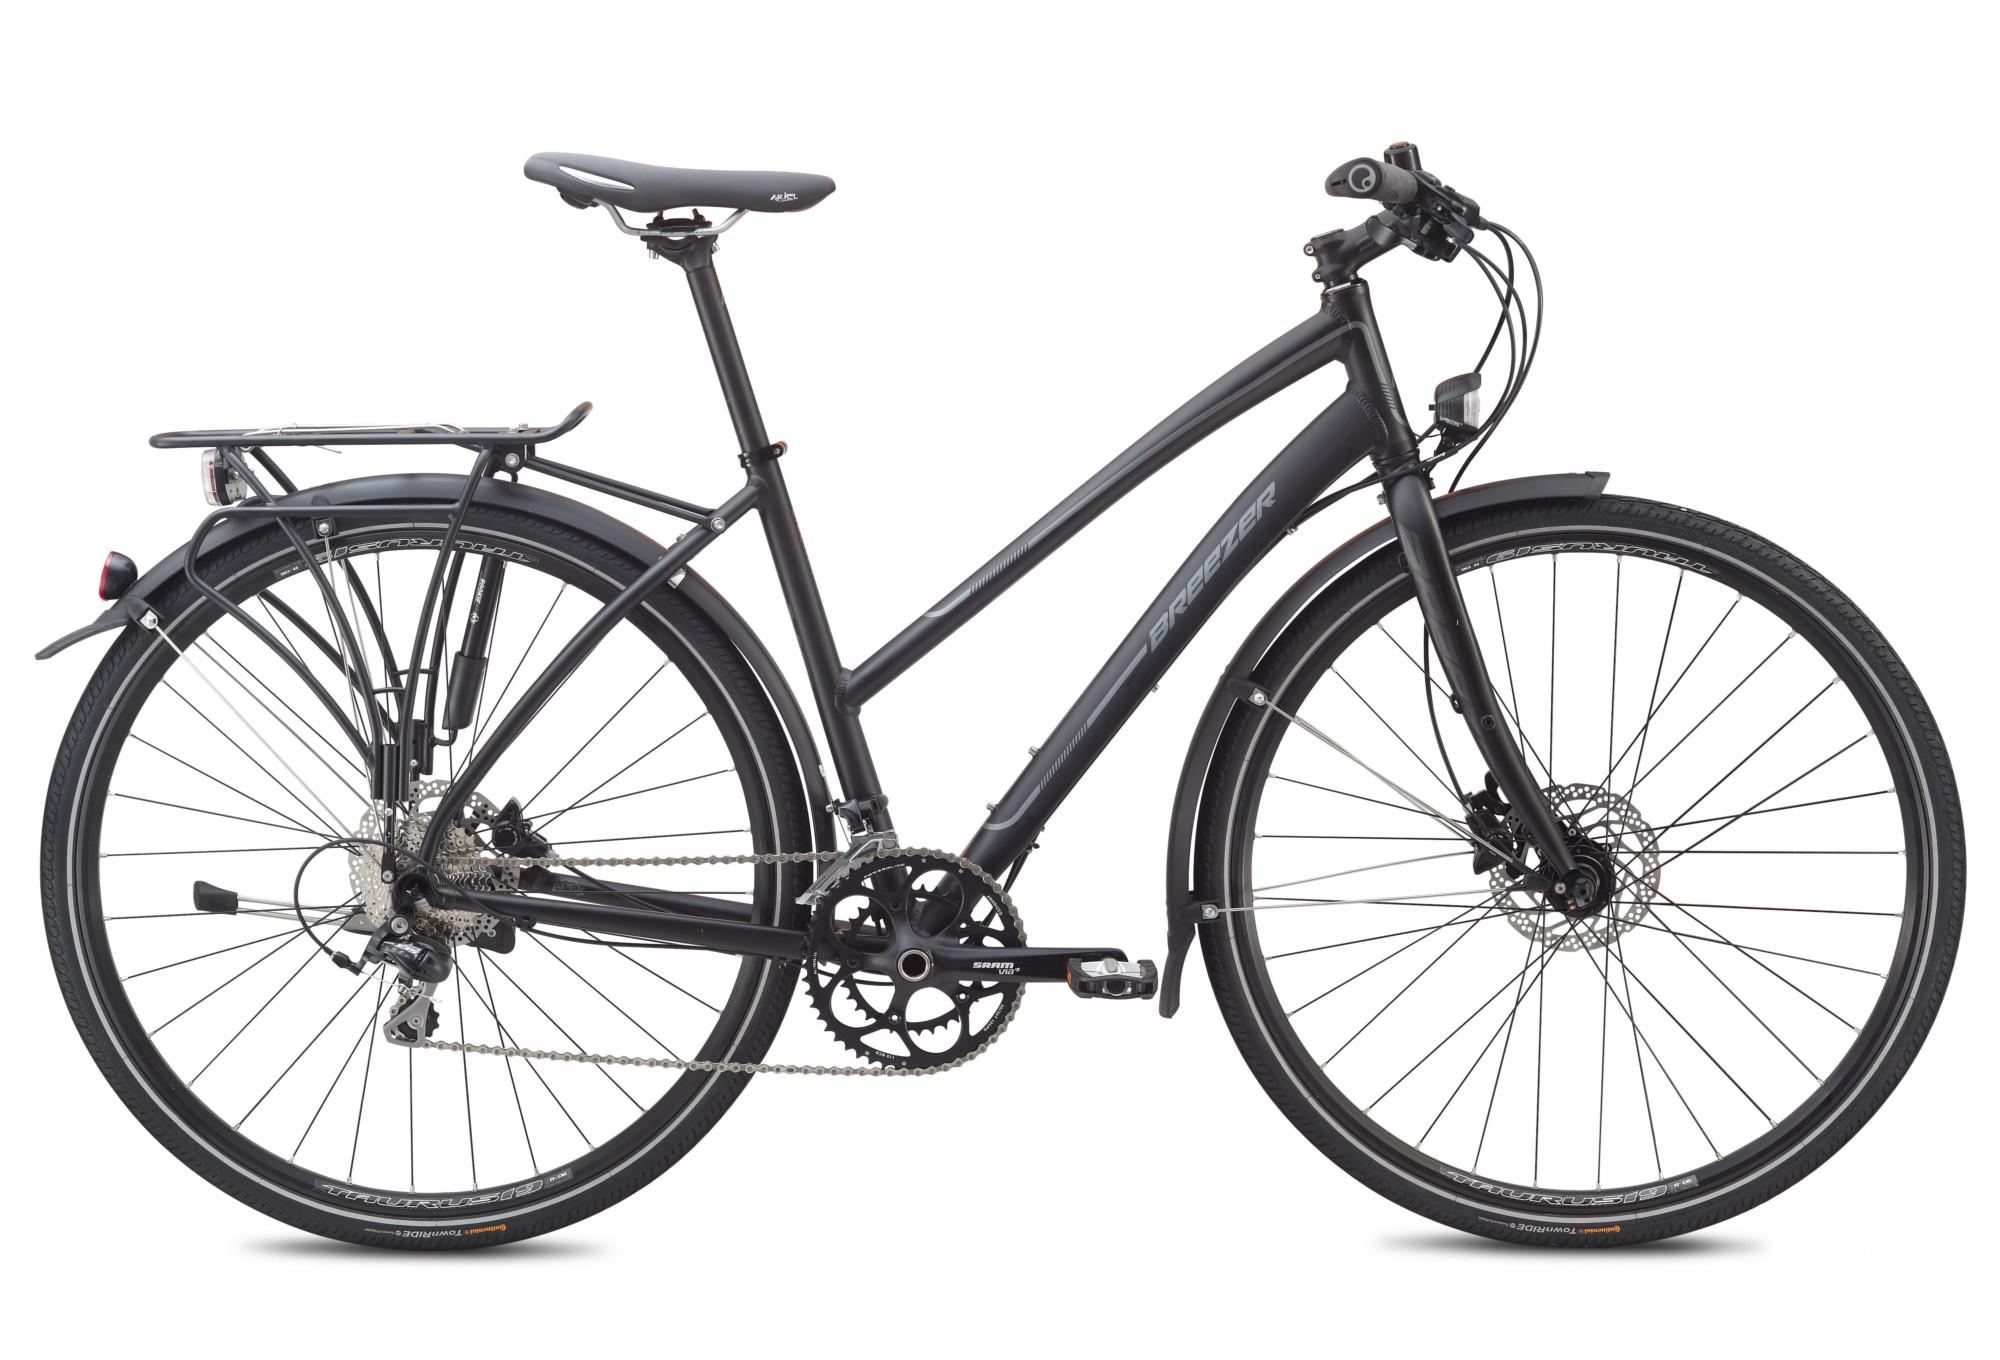 Breezer Woman Trekking Bike Liberty Lite 1 Shimano 105 10 Speed Black